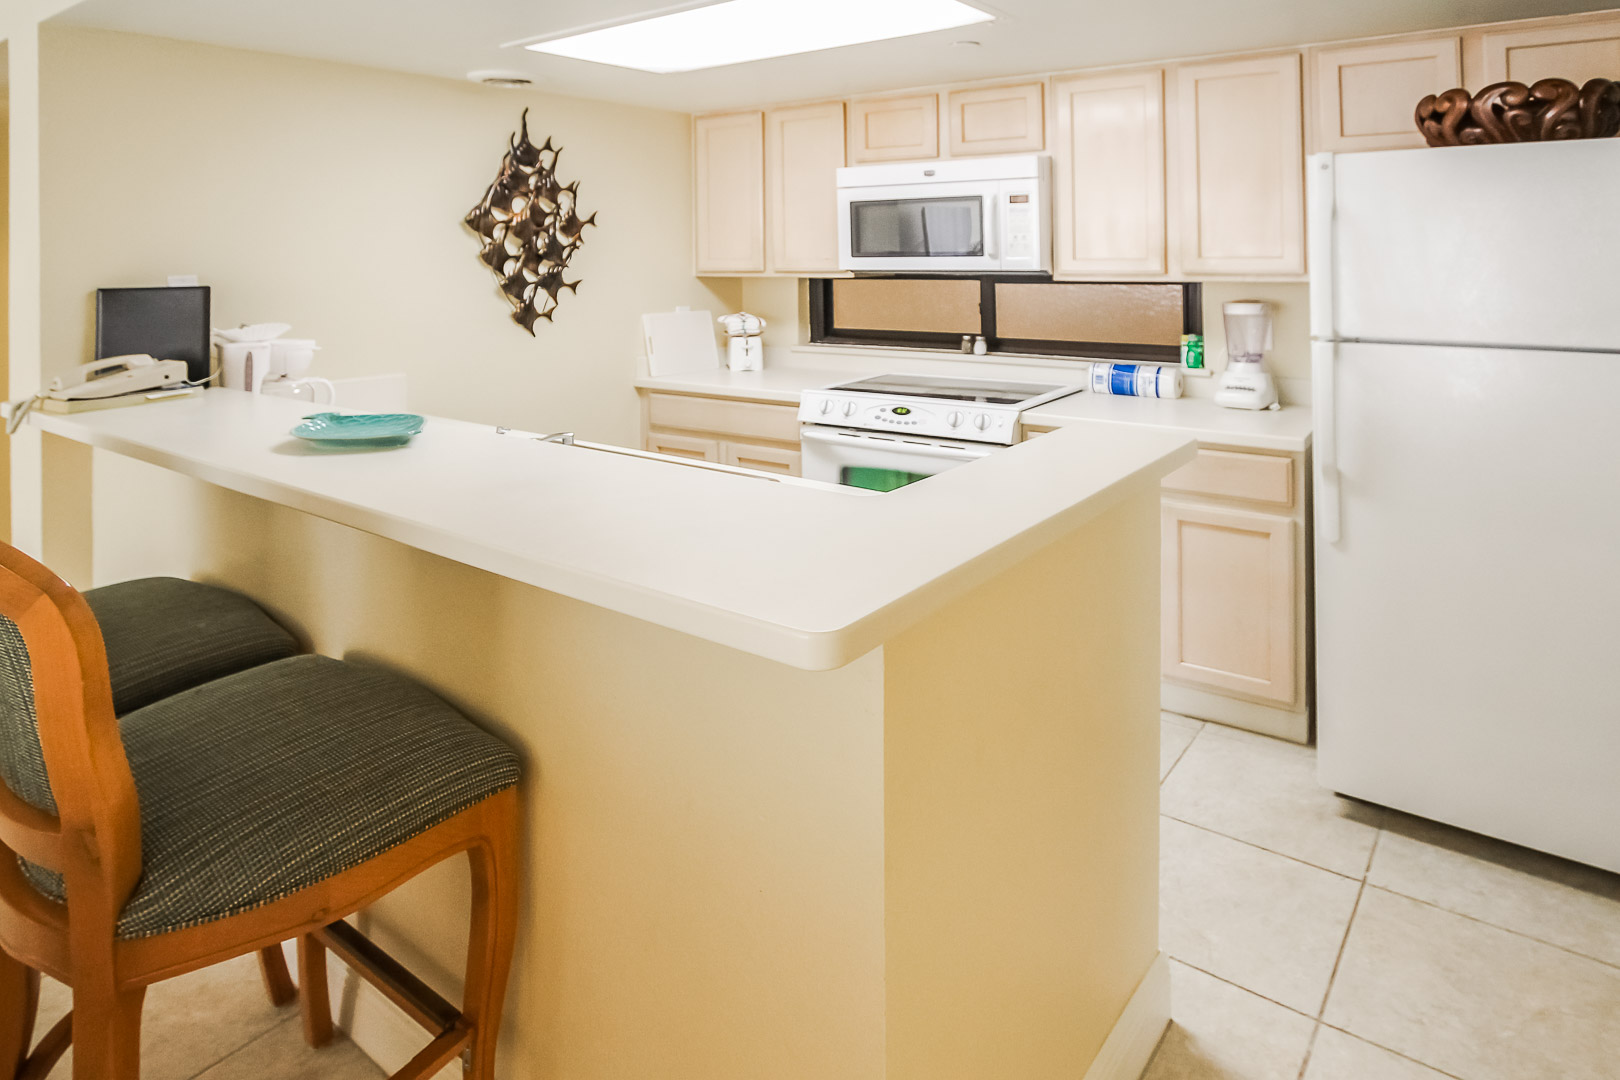 A full kitchen at VRI's Royale Beach Tennis Club in Texas.